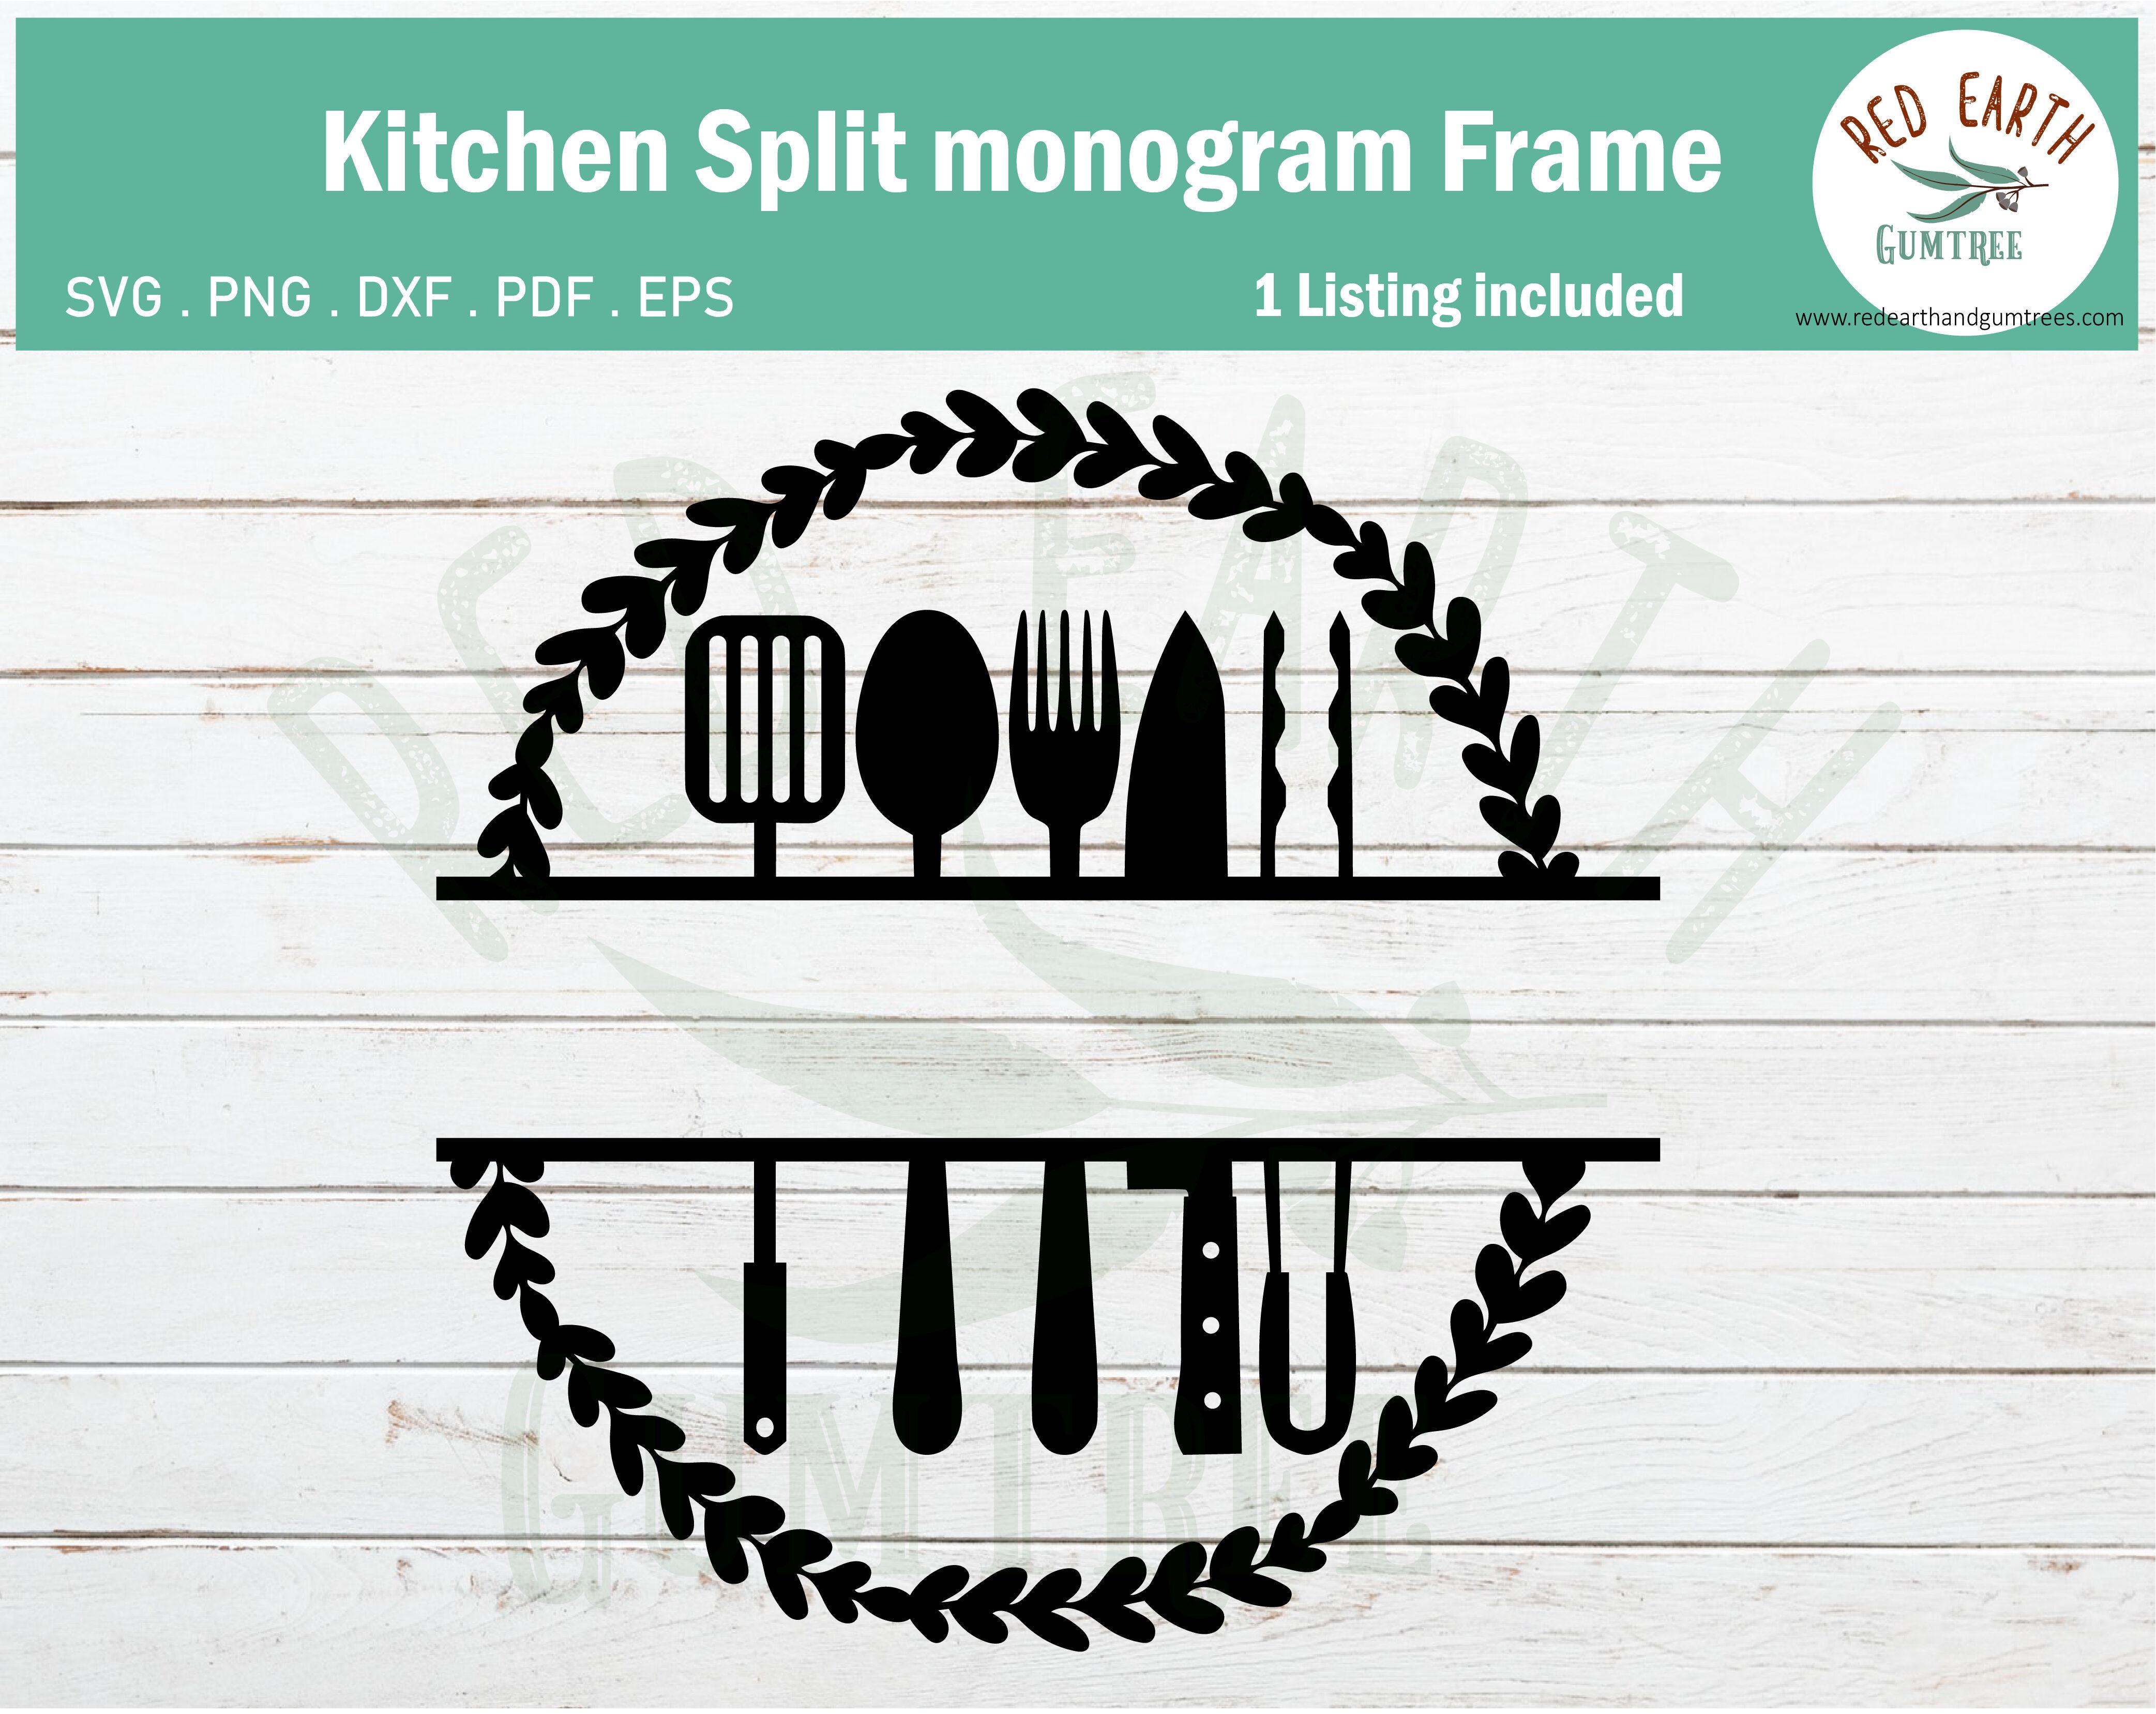 Rustic Kitchen Farmhouse Monogram Frame Svg Png Dxf Pdf Eps By